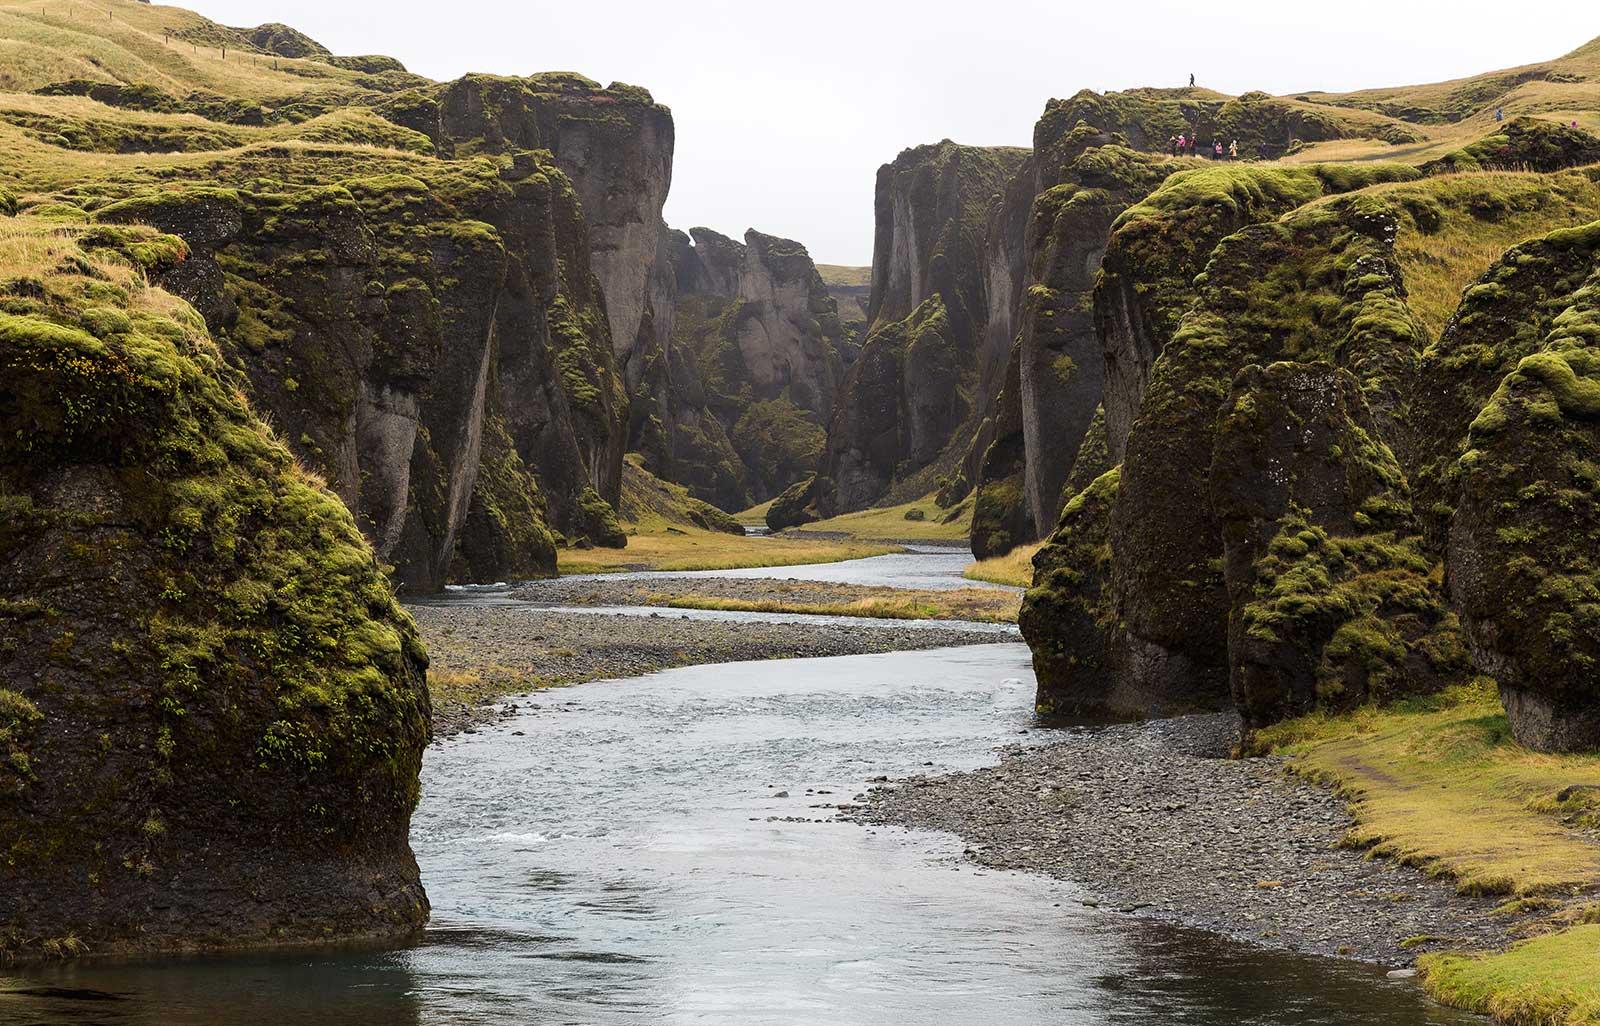 Detour to Tokyo – Bikepacking Across Iceland